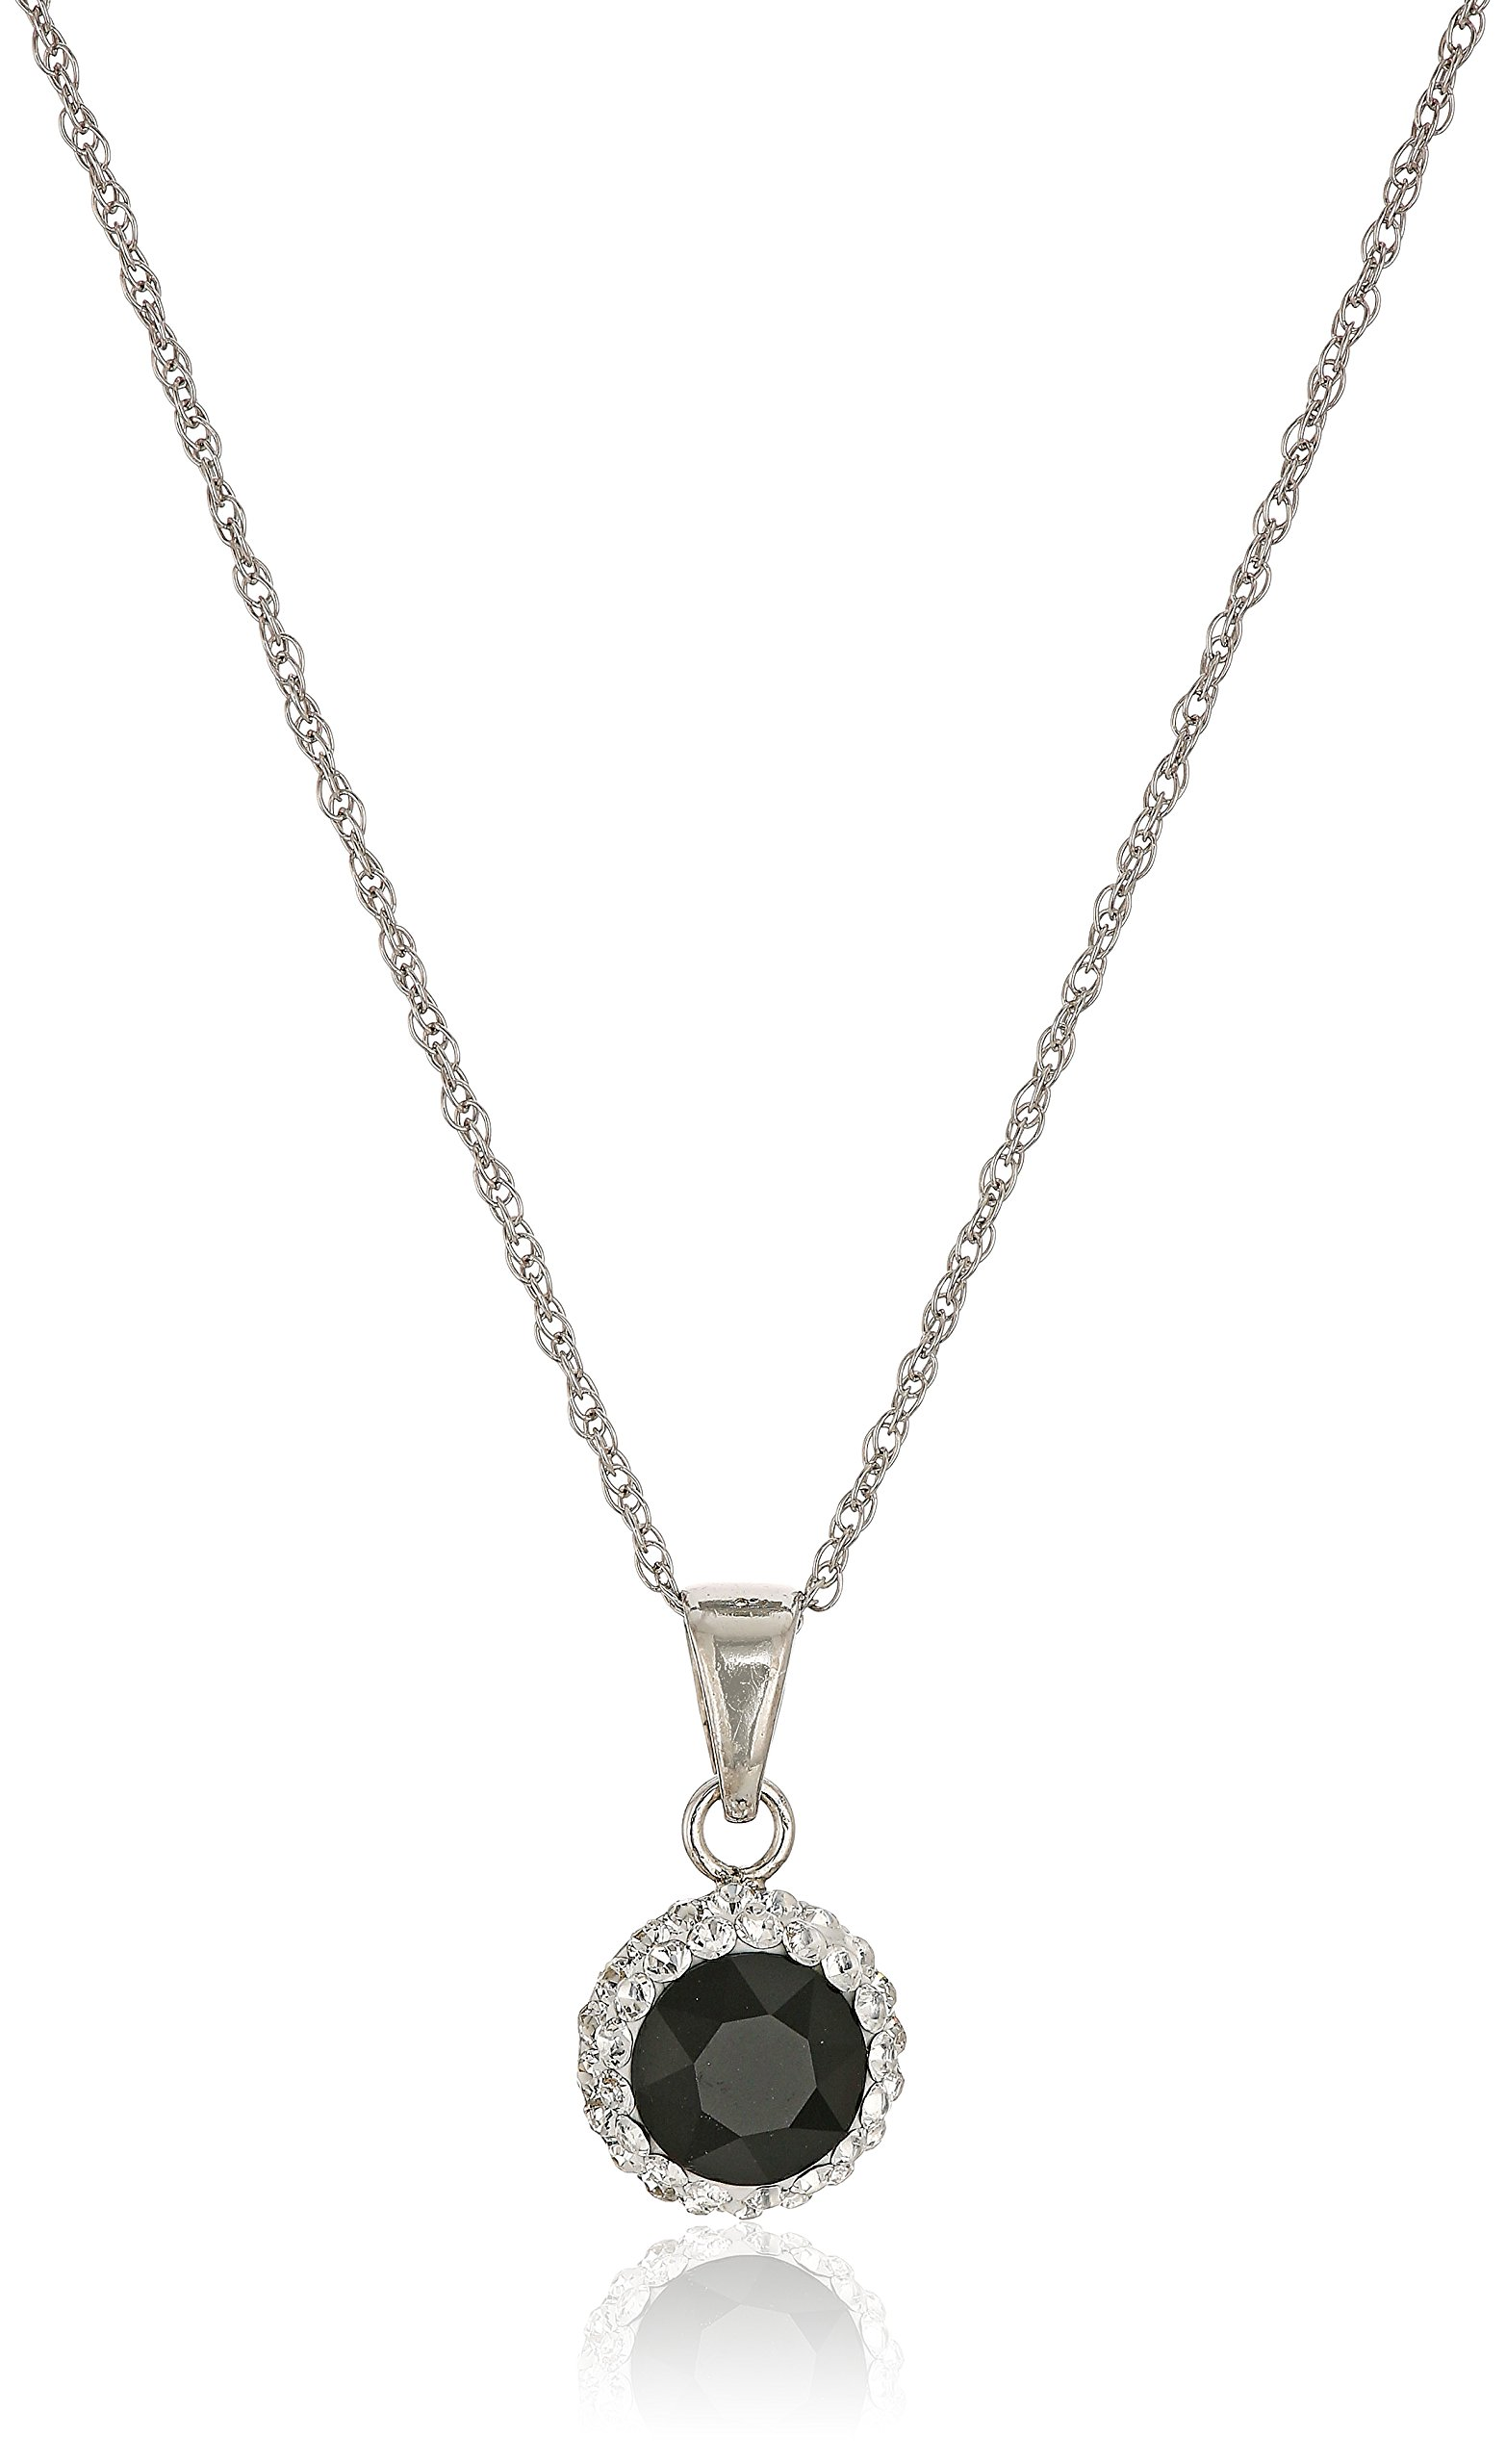 Sterling Silver Swarovski Crystal Halo Pendant Necklace, Black, 18''